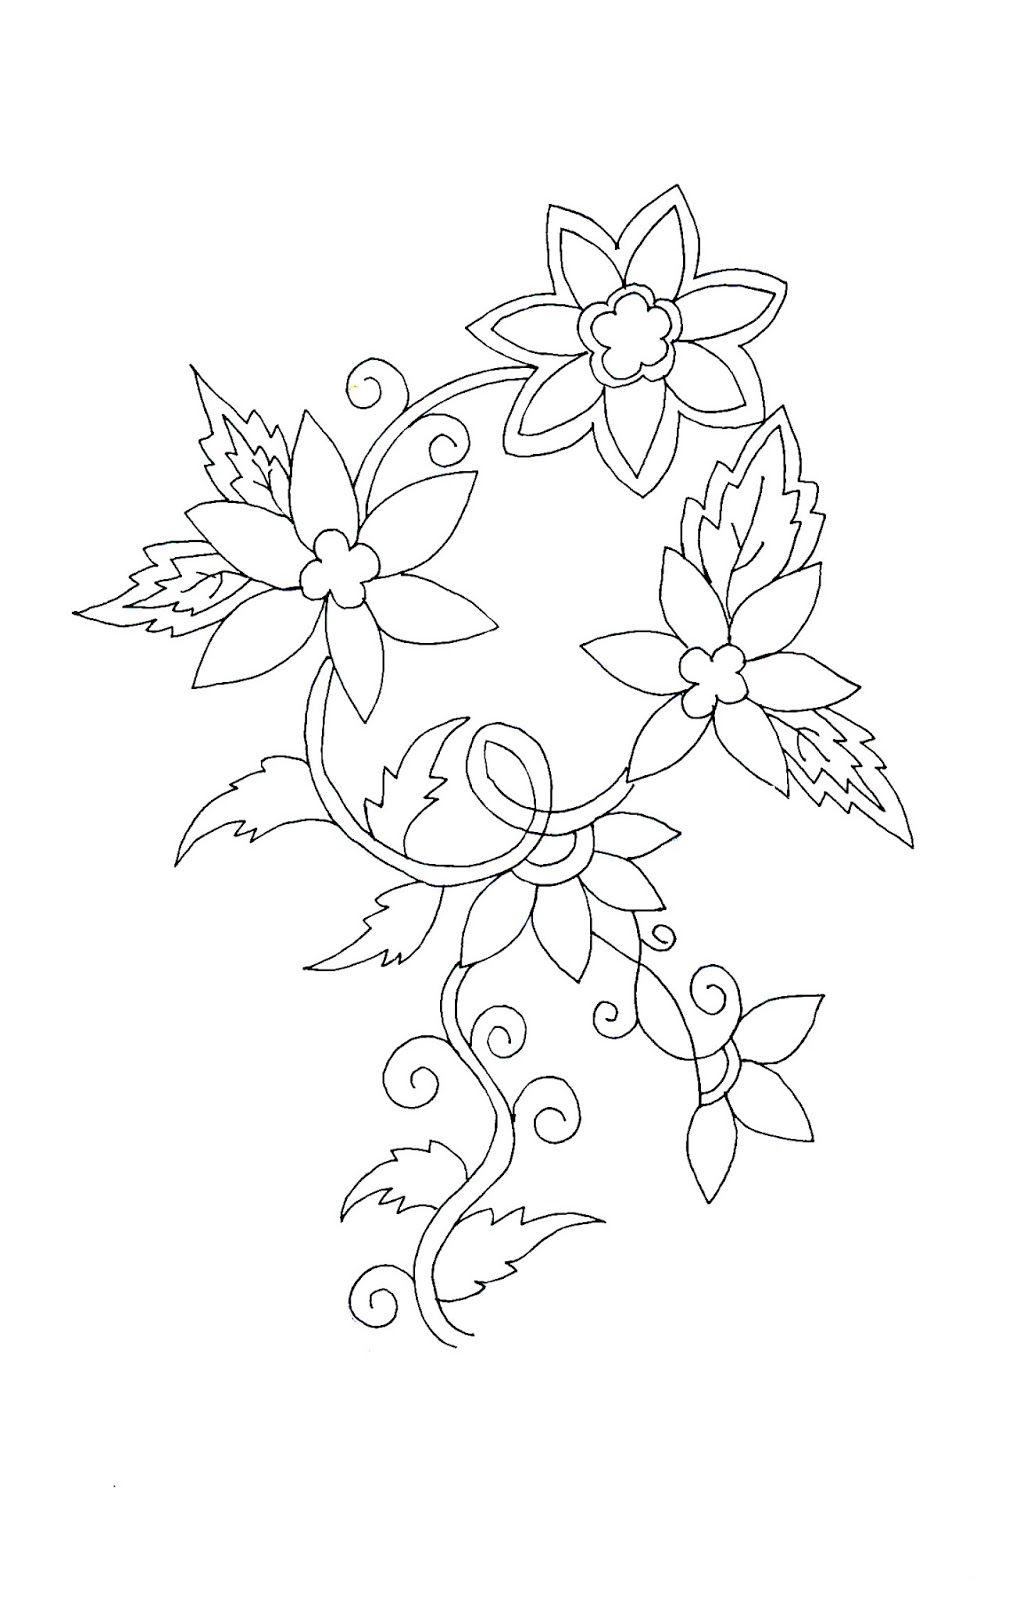 Legújabb vázlatok Sárika Agrawal - Emb (With images) | Simple flower design, Simple flower ...